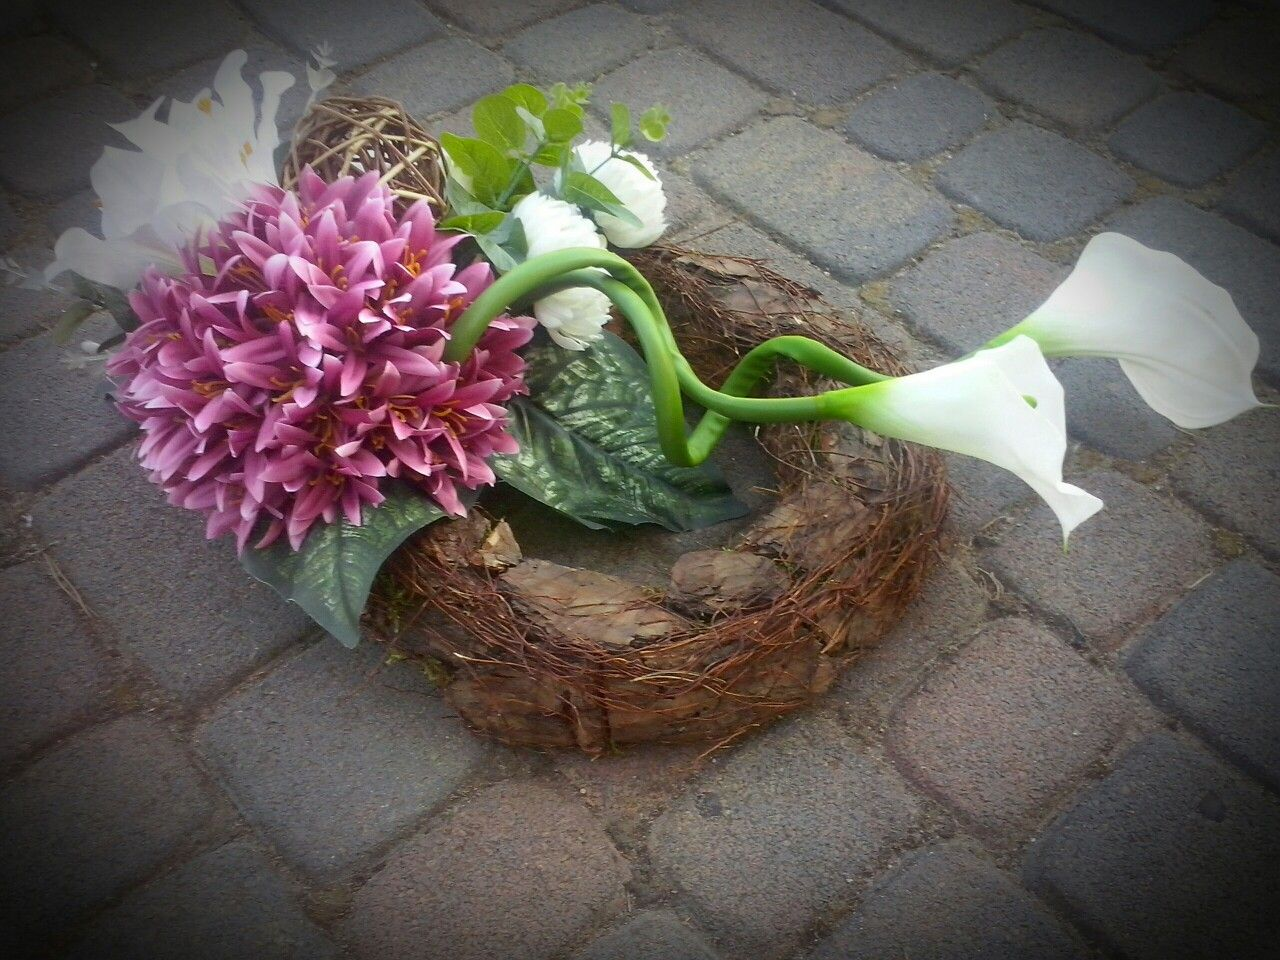 Kompozycje Nagrobne 2016 Biale Kalie Plants